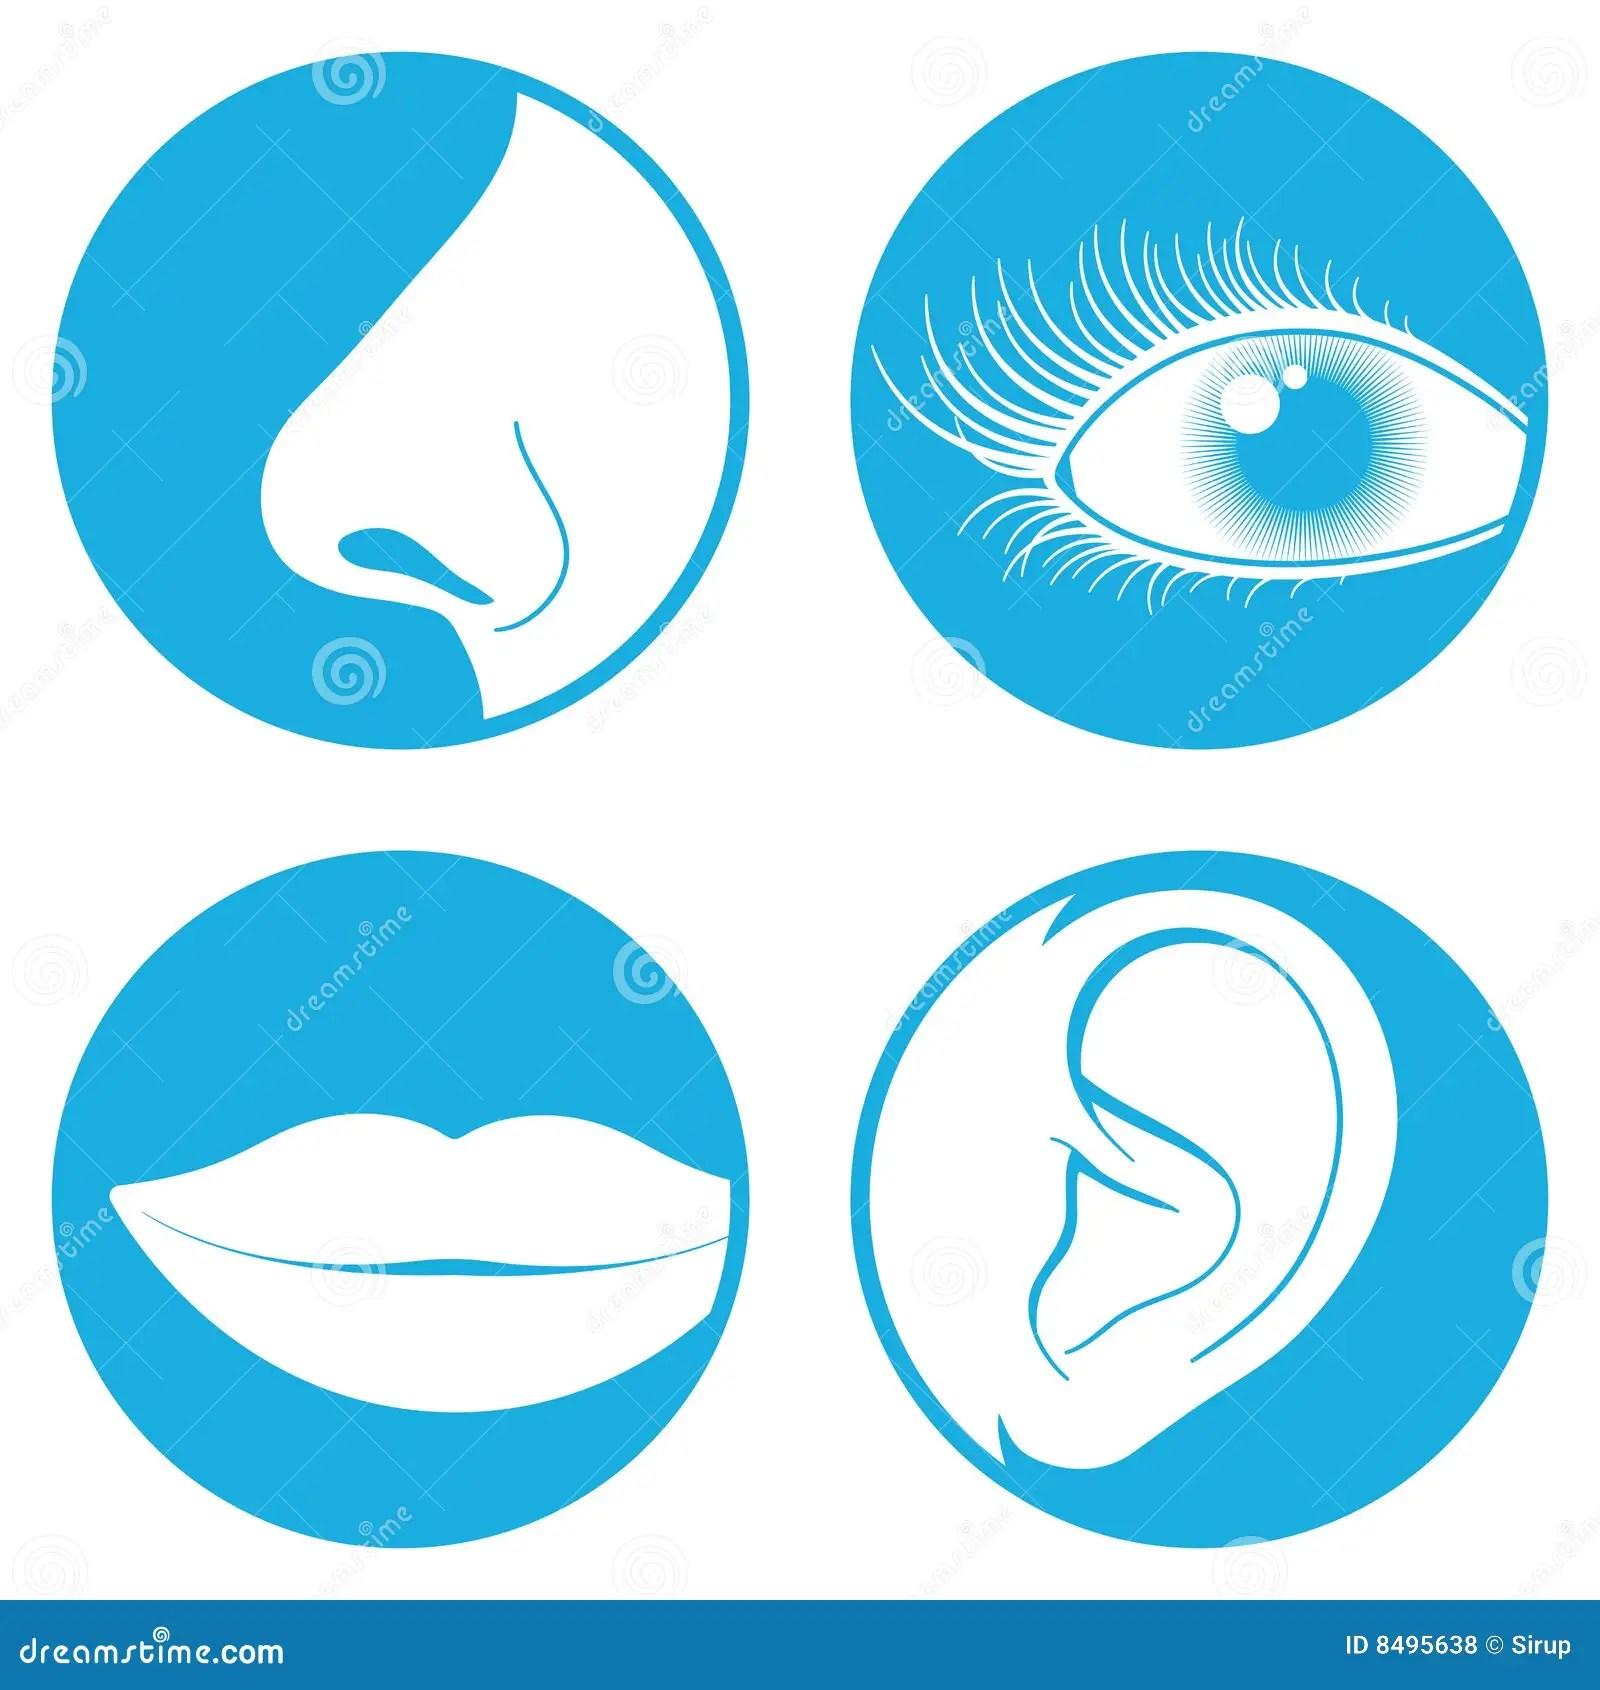 Nose Eye Mouth Ear Pictogram Royalty Free Stock Photos